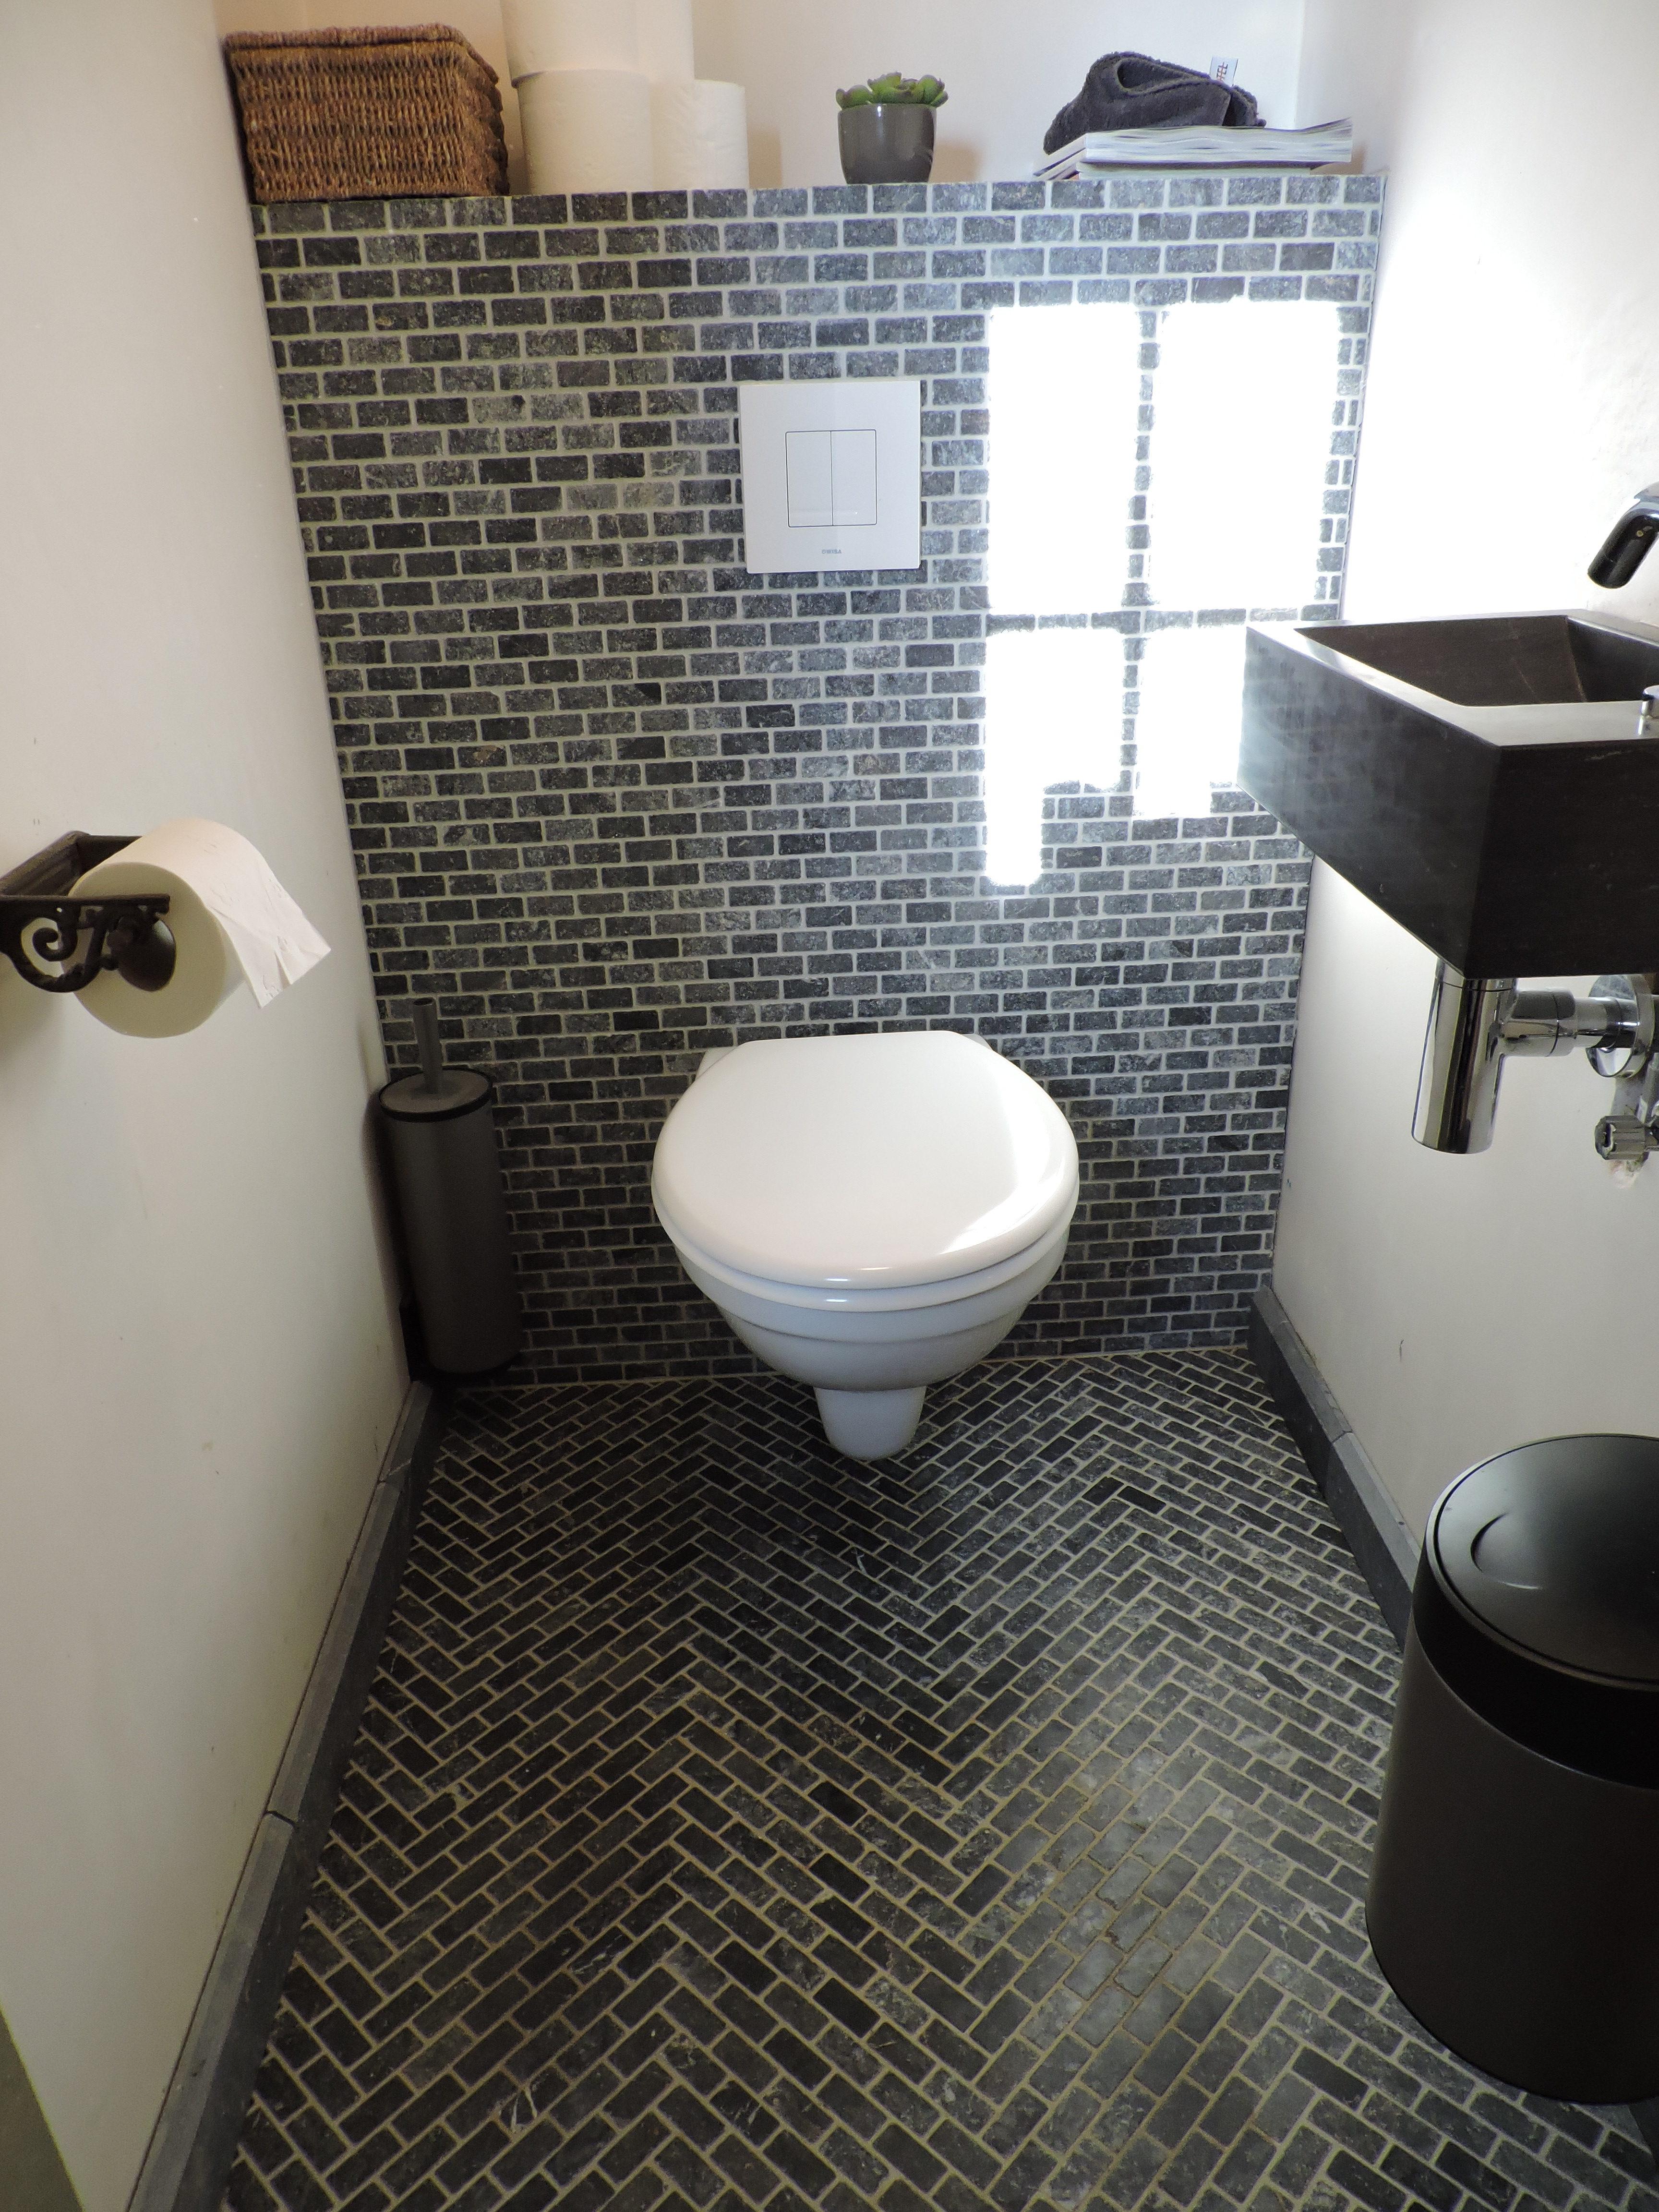 wand-arduin-mozaïek-toilet-e1484856307642